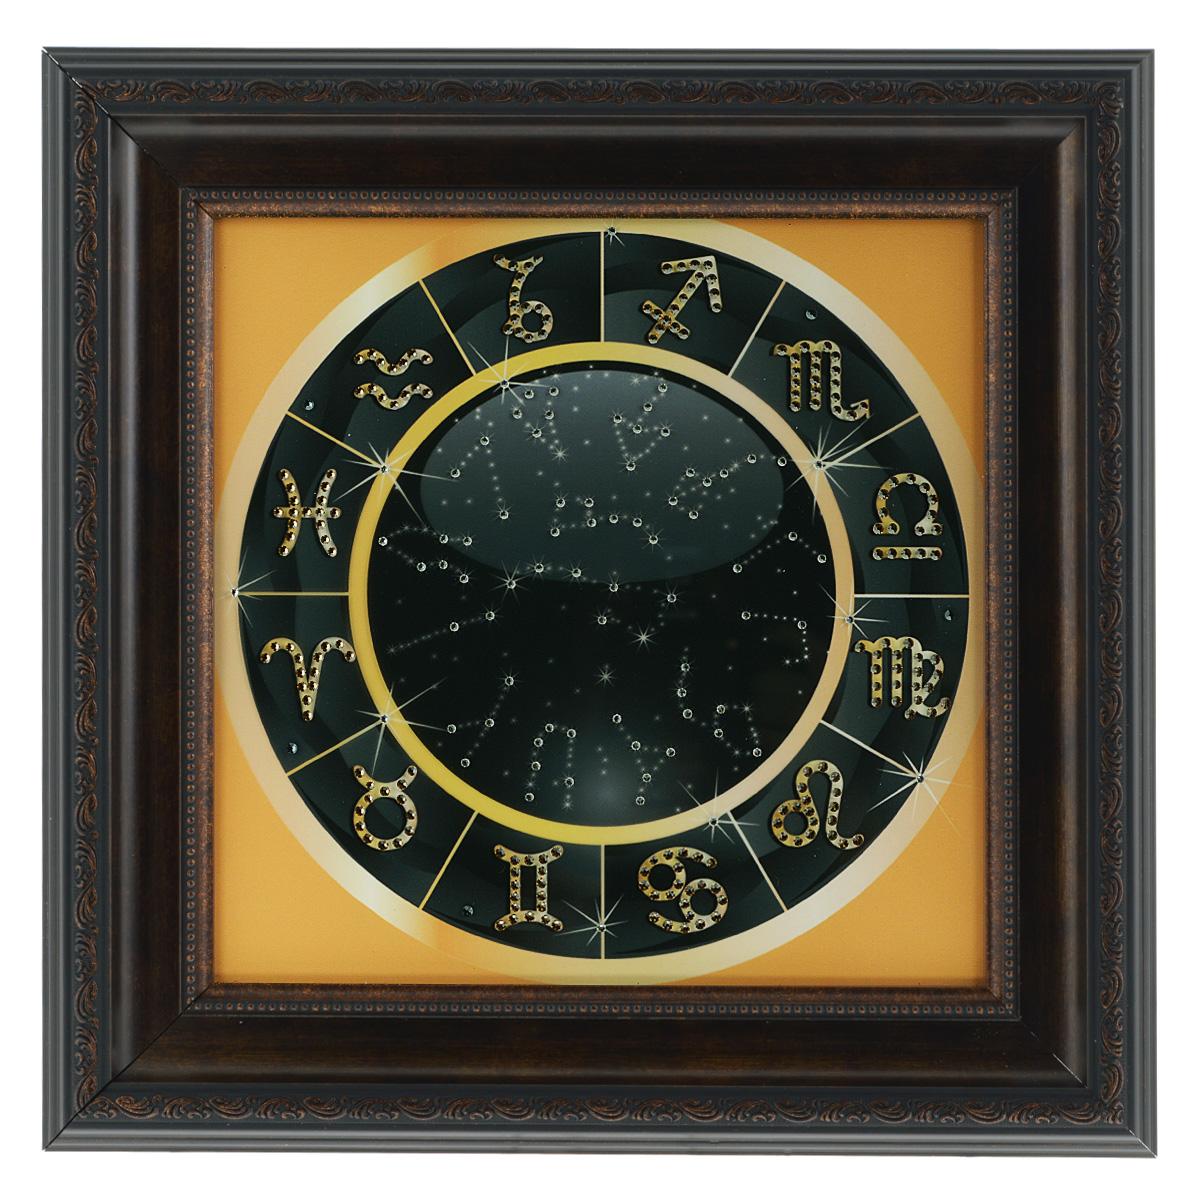 Картина с кристаллами Swarovski Знаки зодиака, 41 х 41 см картины в квартиру картина etude 2 102х130 см